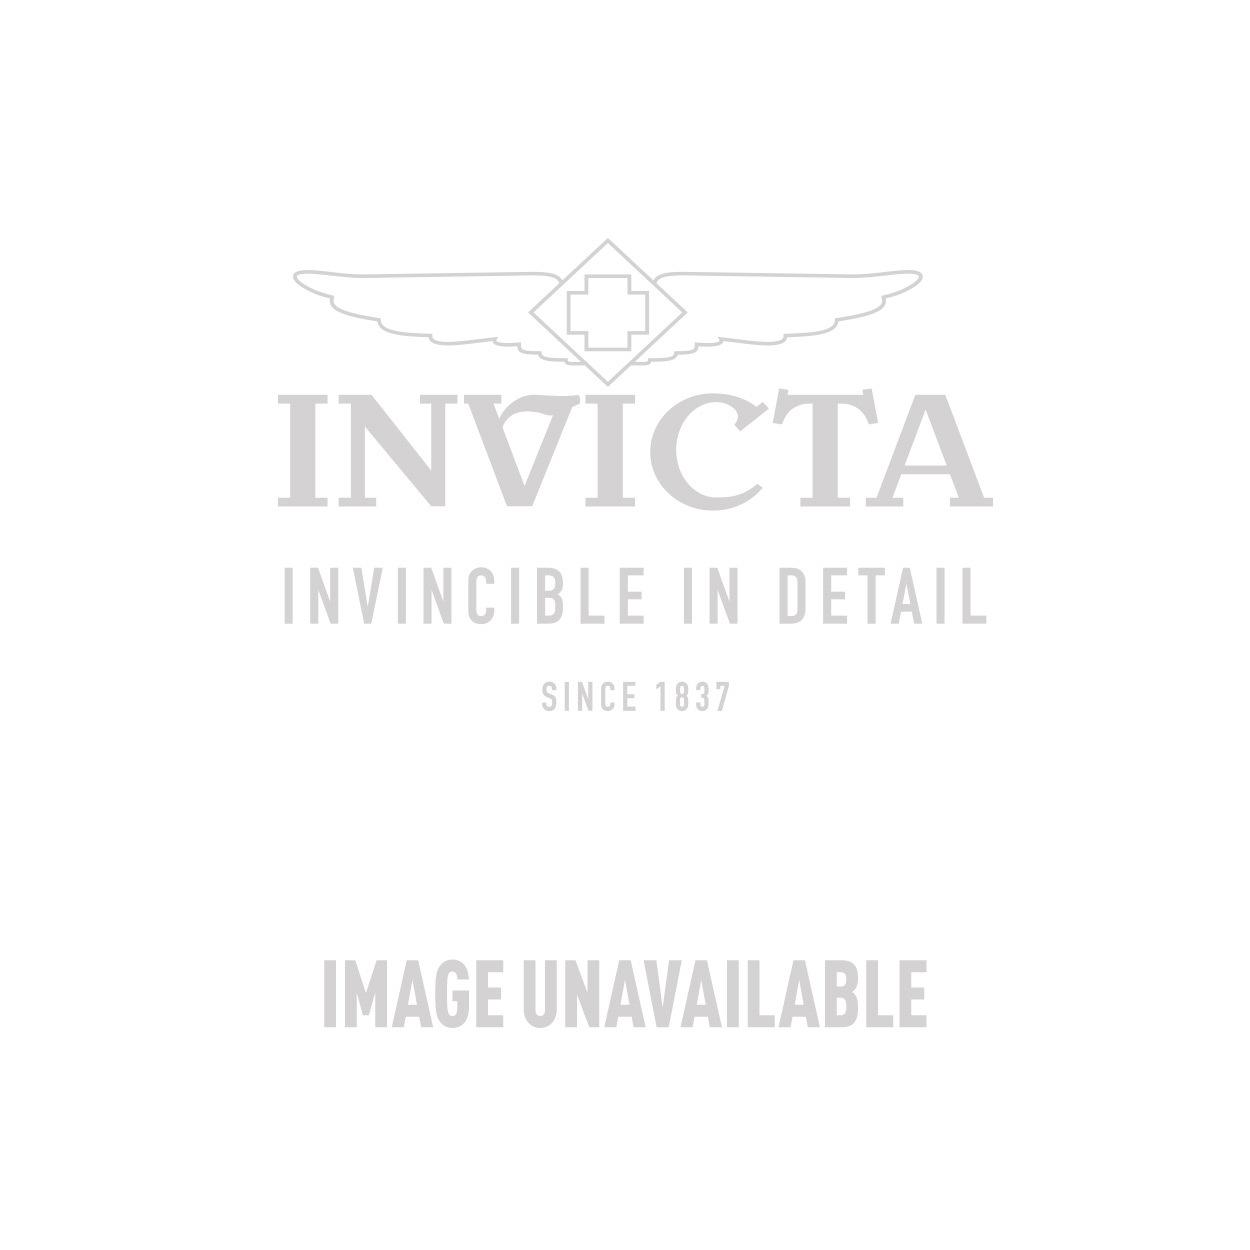 Invicta Disney 24417